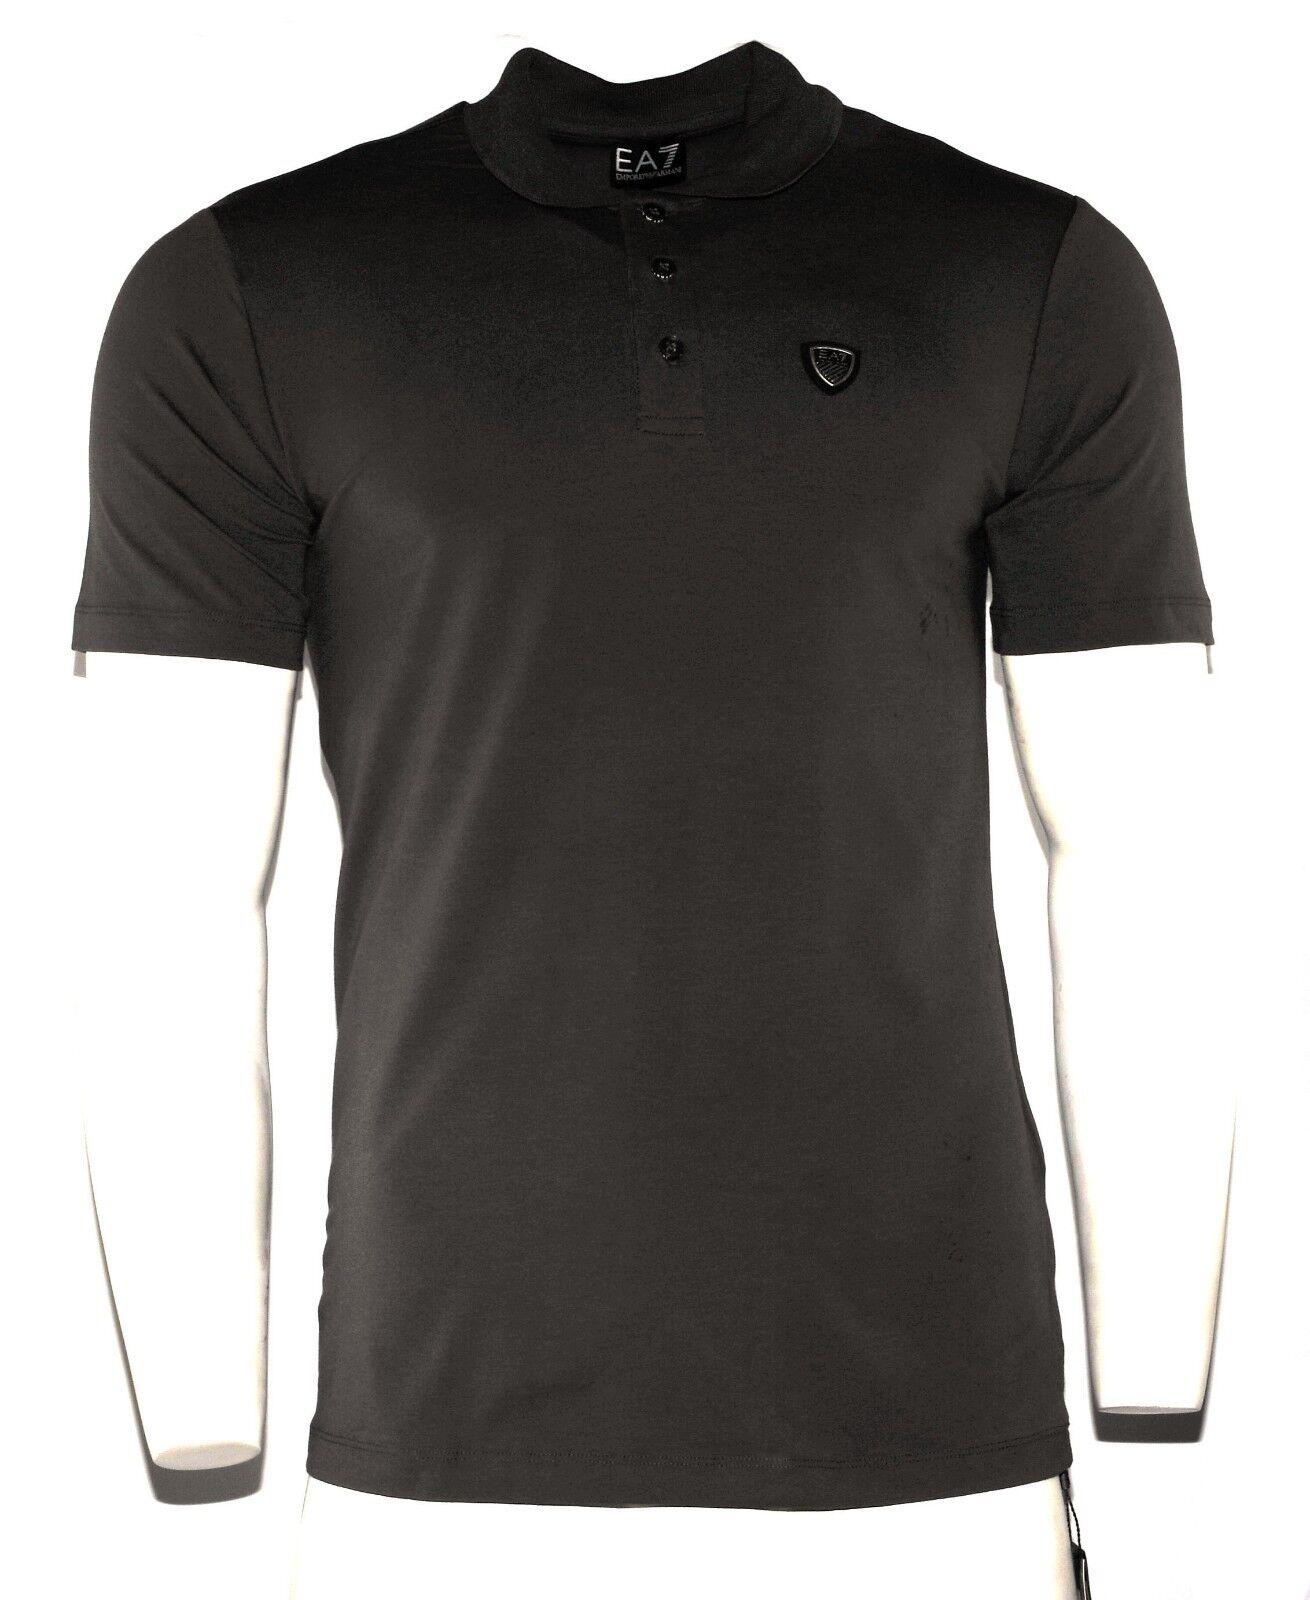 Armani Jeans Kurzärmlig Herren Polohemd - Grau Größe S M L XL XXL  | Good Design